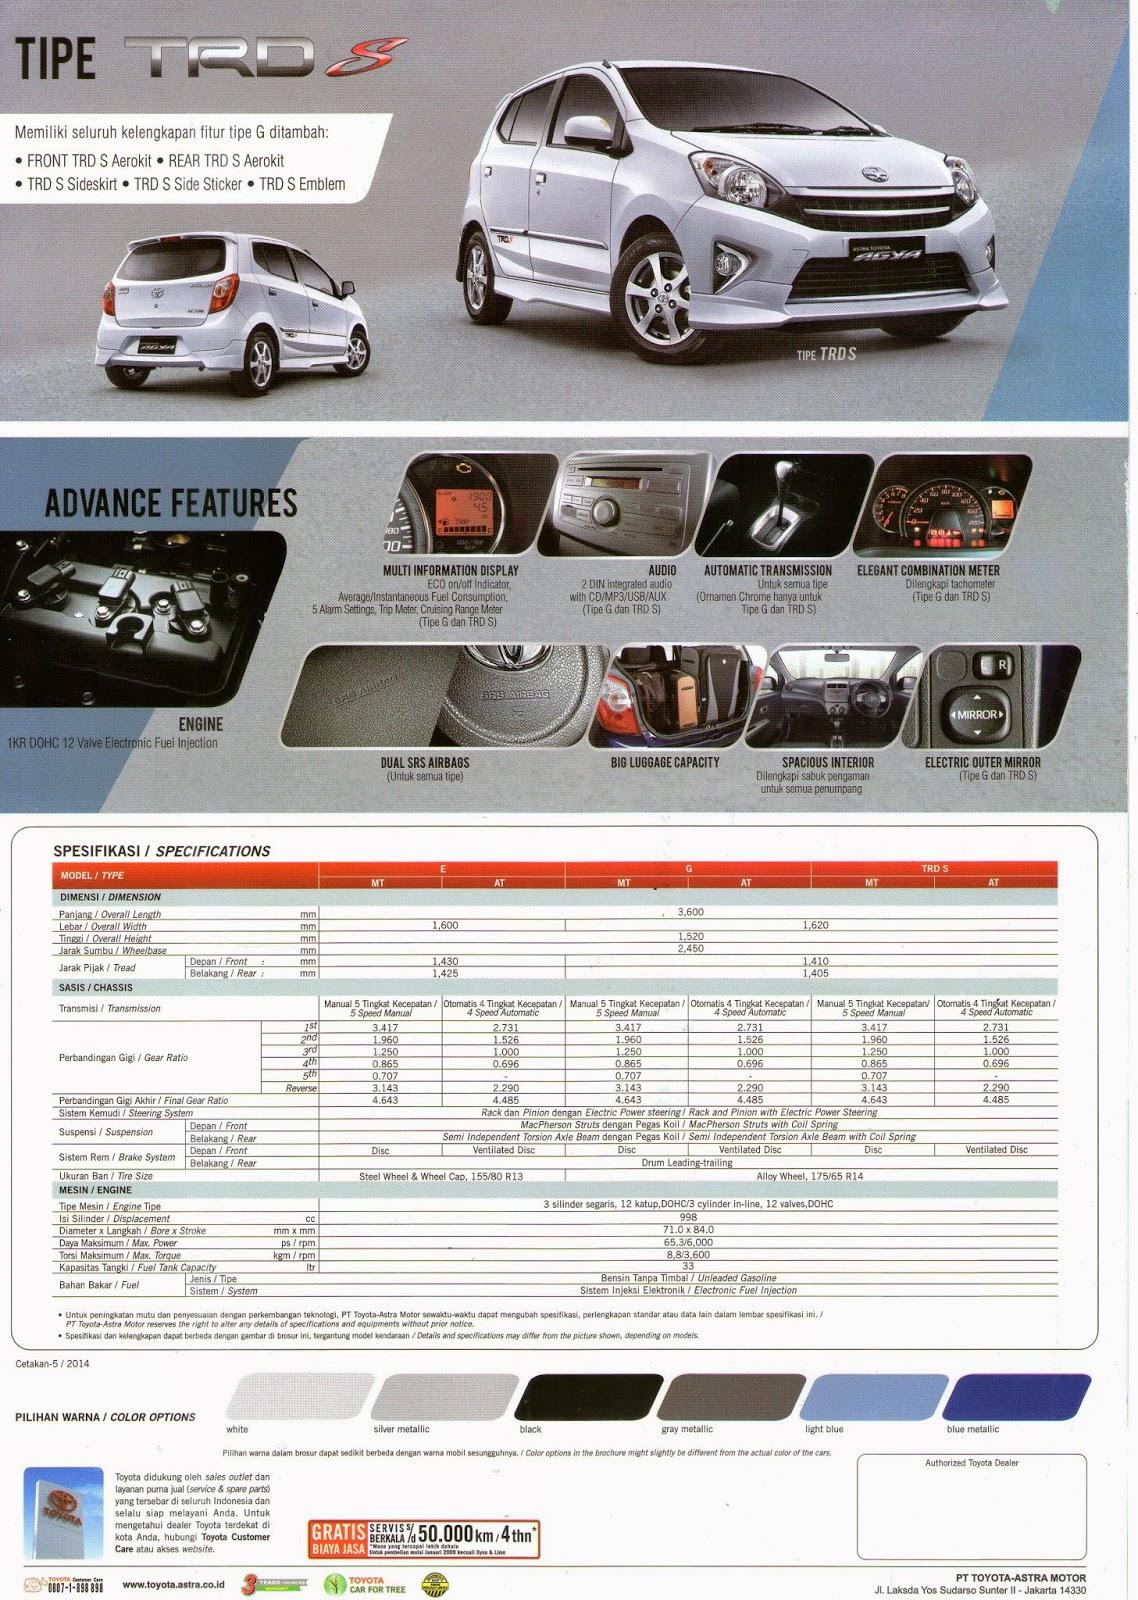 Harga New Agya Trd Interior Toyota Grand Veloz Pt Wira Megah Profitamas I